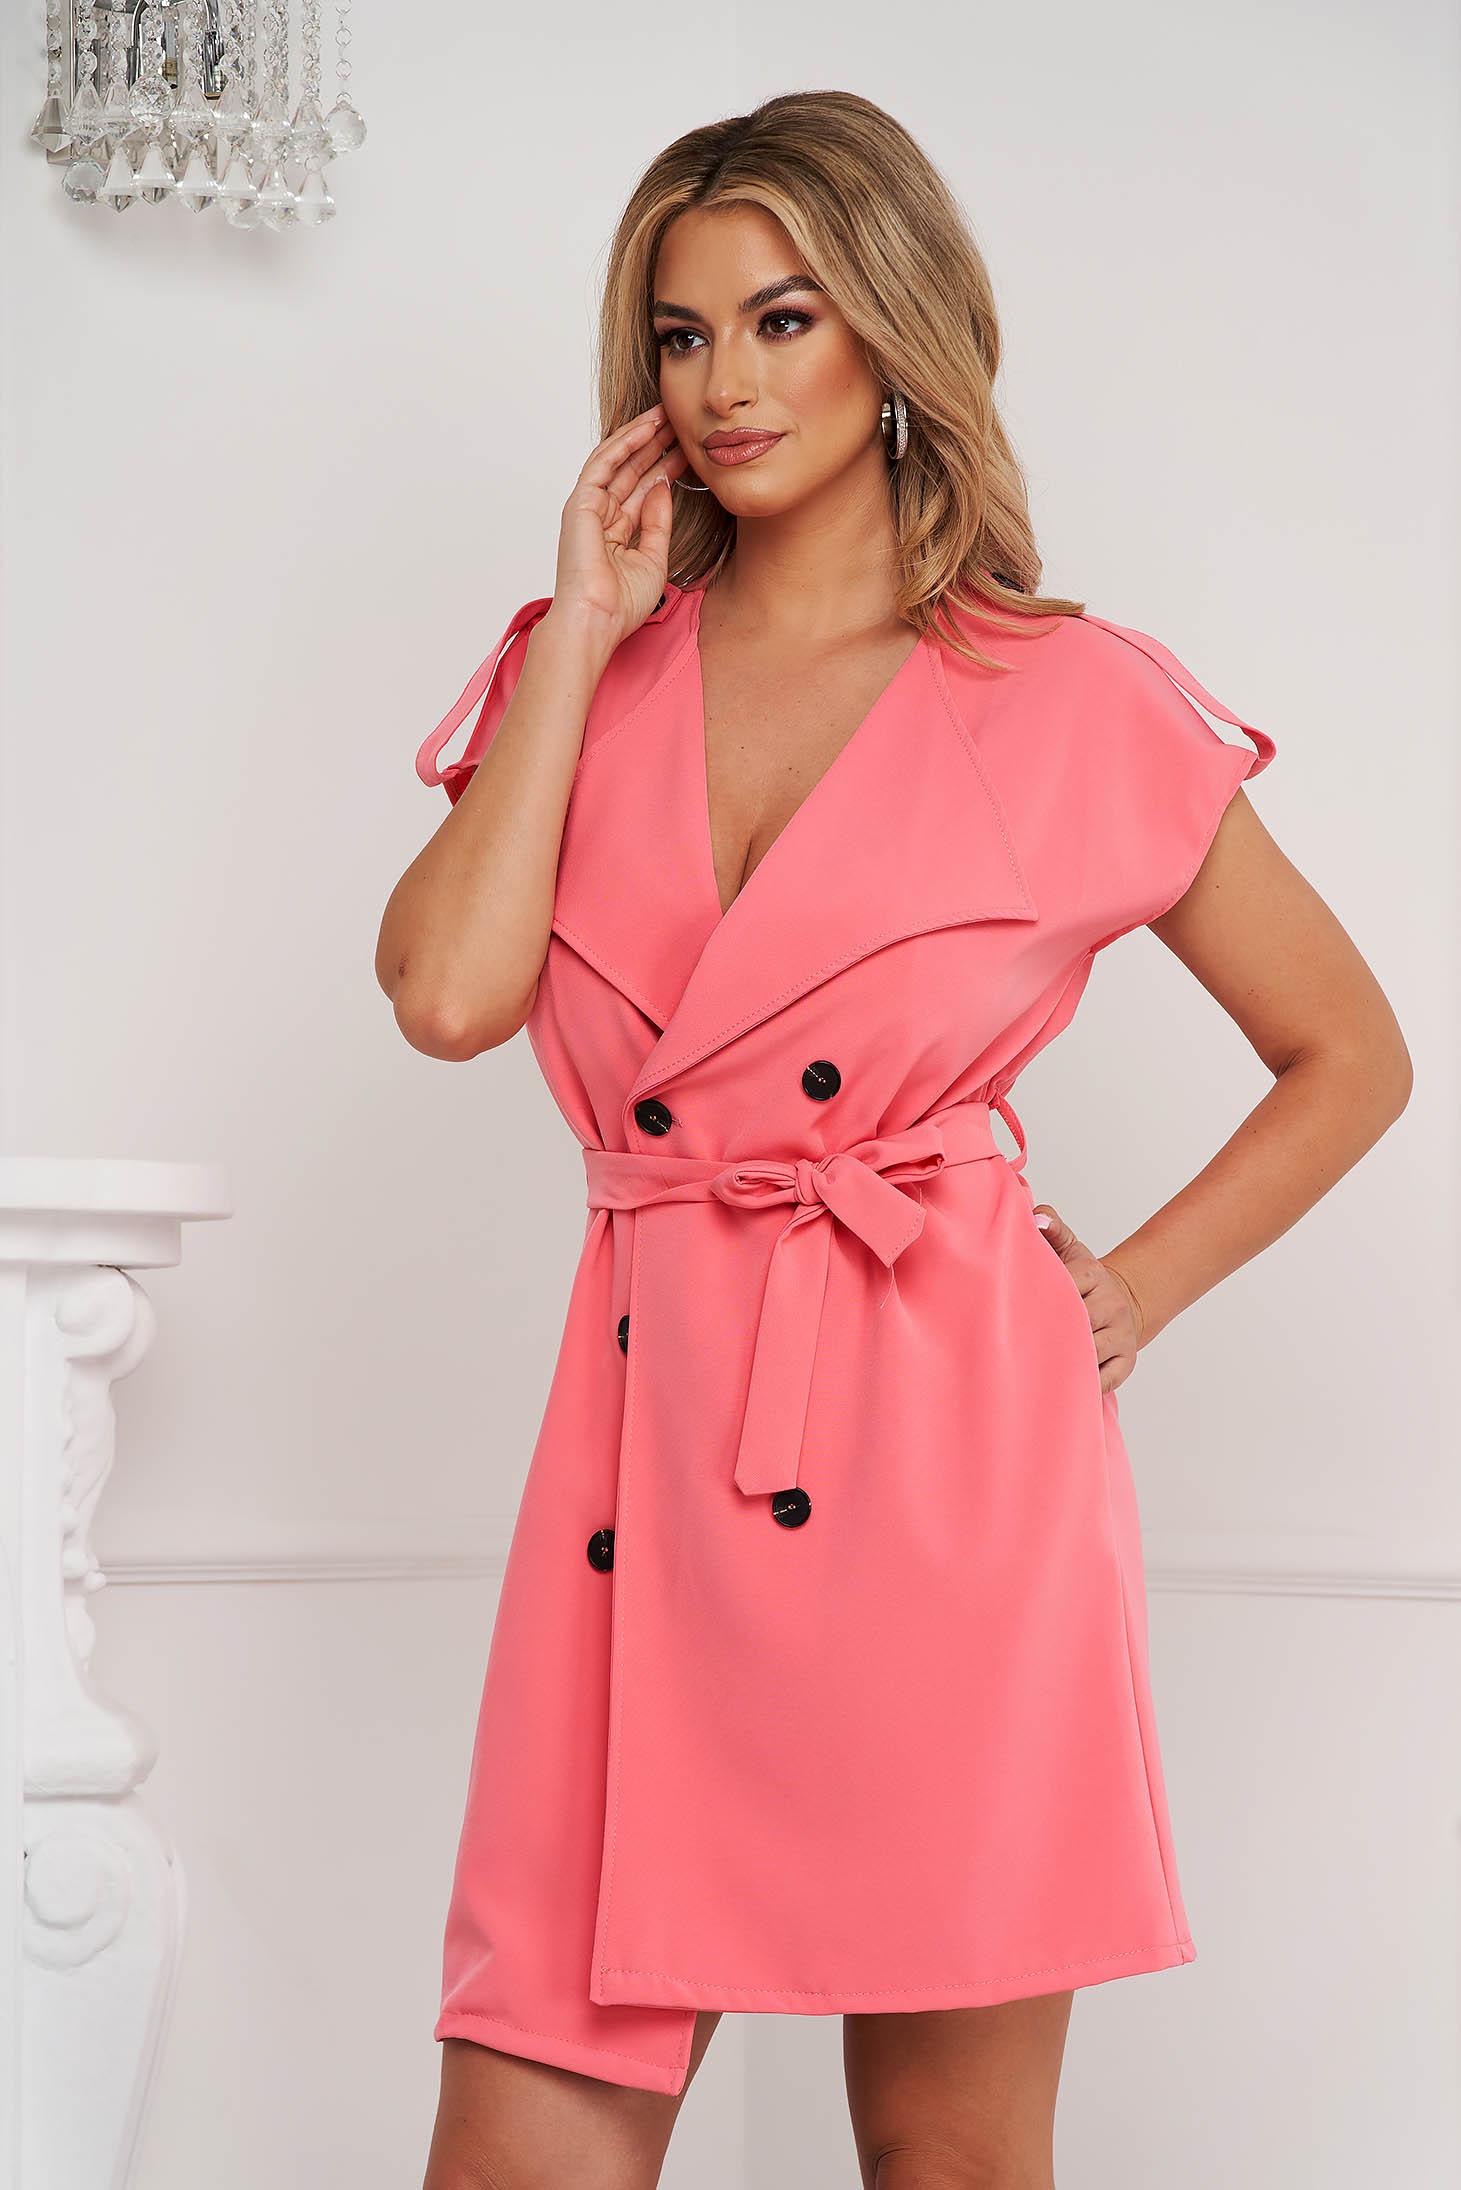 Rochie tip vesta SunShine roz accesorizata cu cordon din material usor elastic cu buzunare